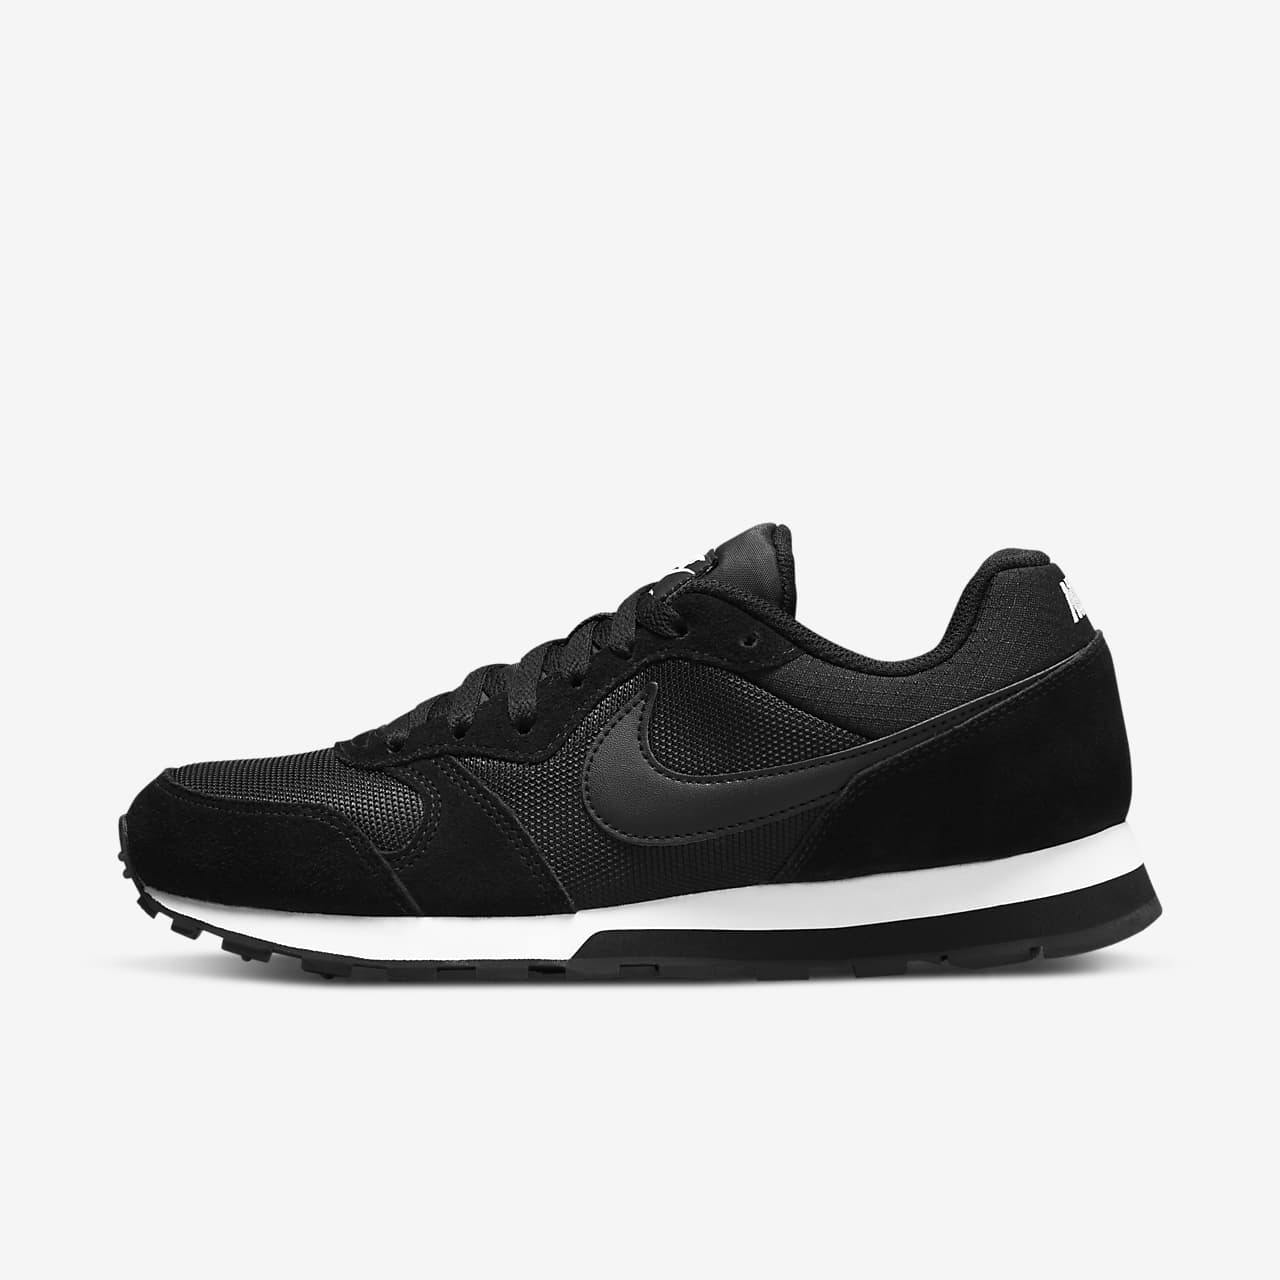 143d40bff8da Nike MD Runner 2 damesko. Nike.com NO